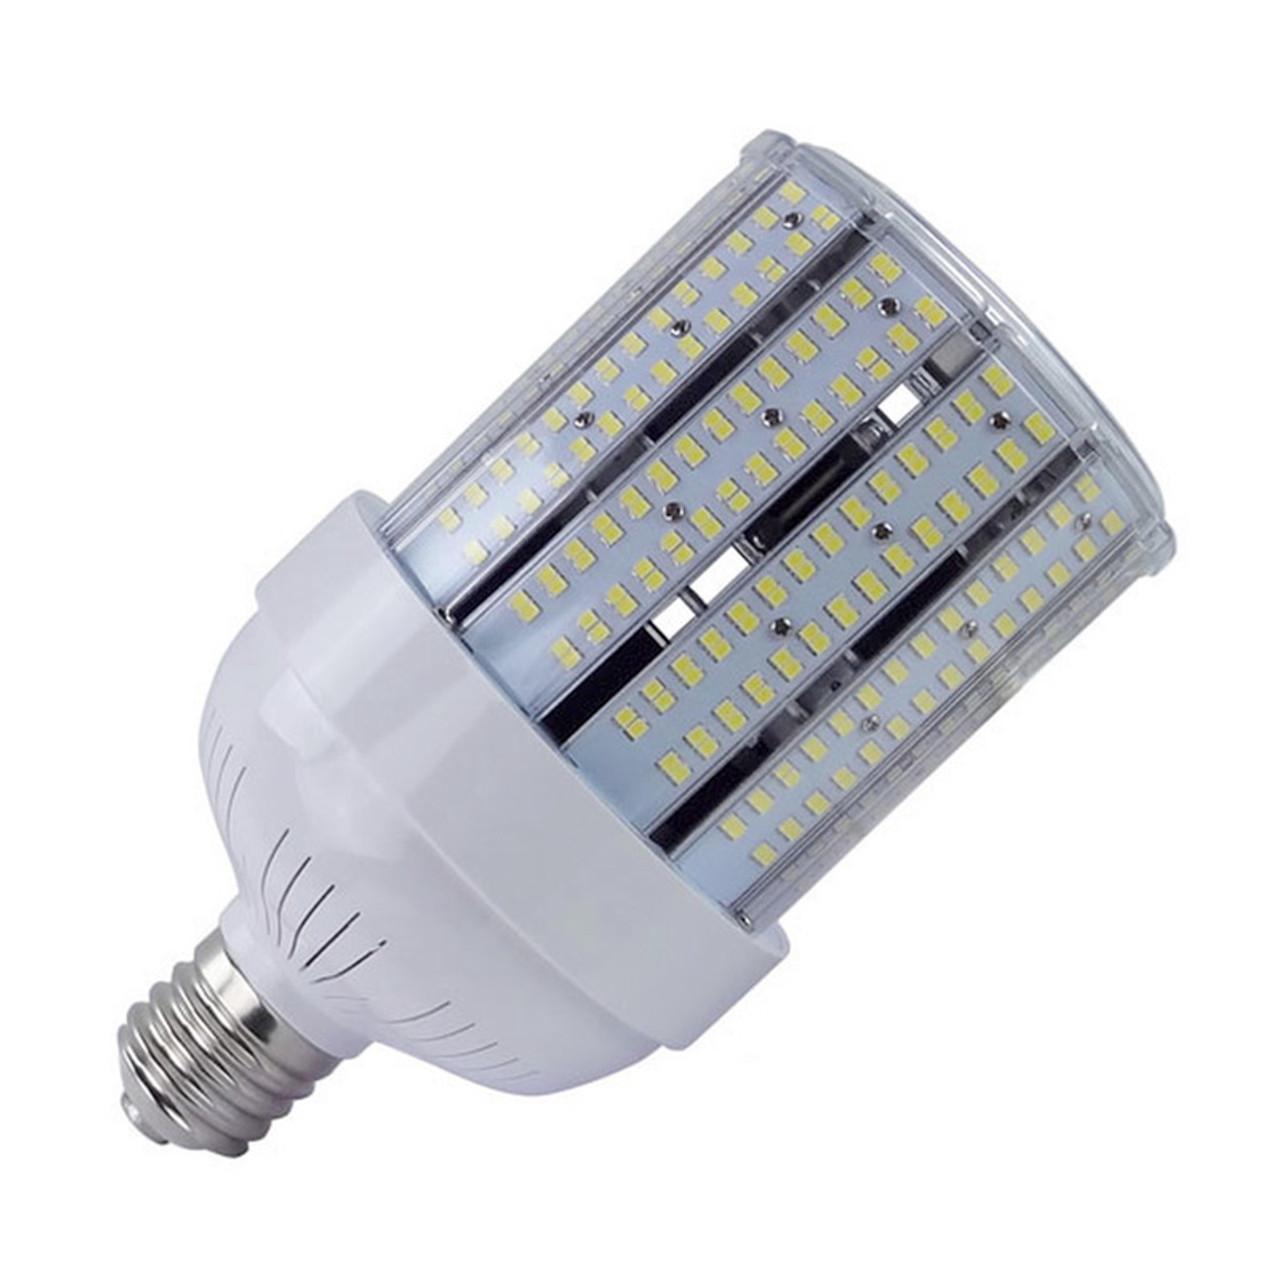 135 Watt Stubby Led Corn Bulb Replaces 500 Watt Hid 20 250 Lumens Dlc Listed Etl Listed 50 000 Hours 10 Year Warranty Led Global Supply